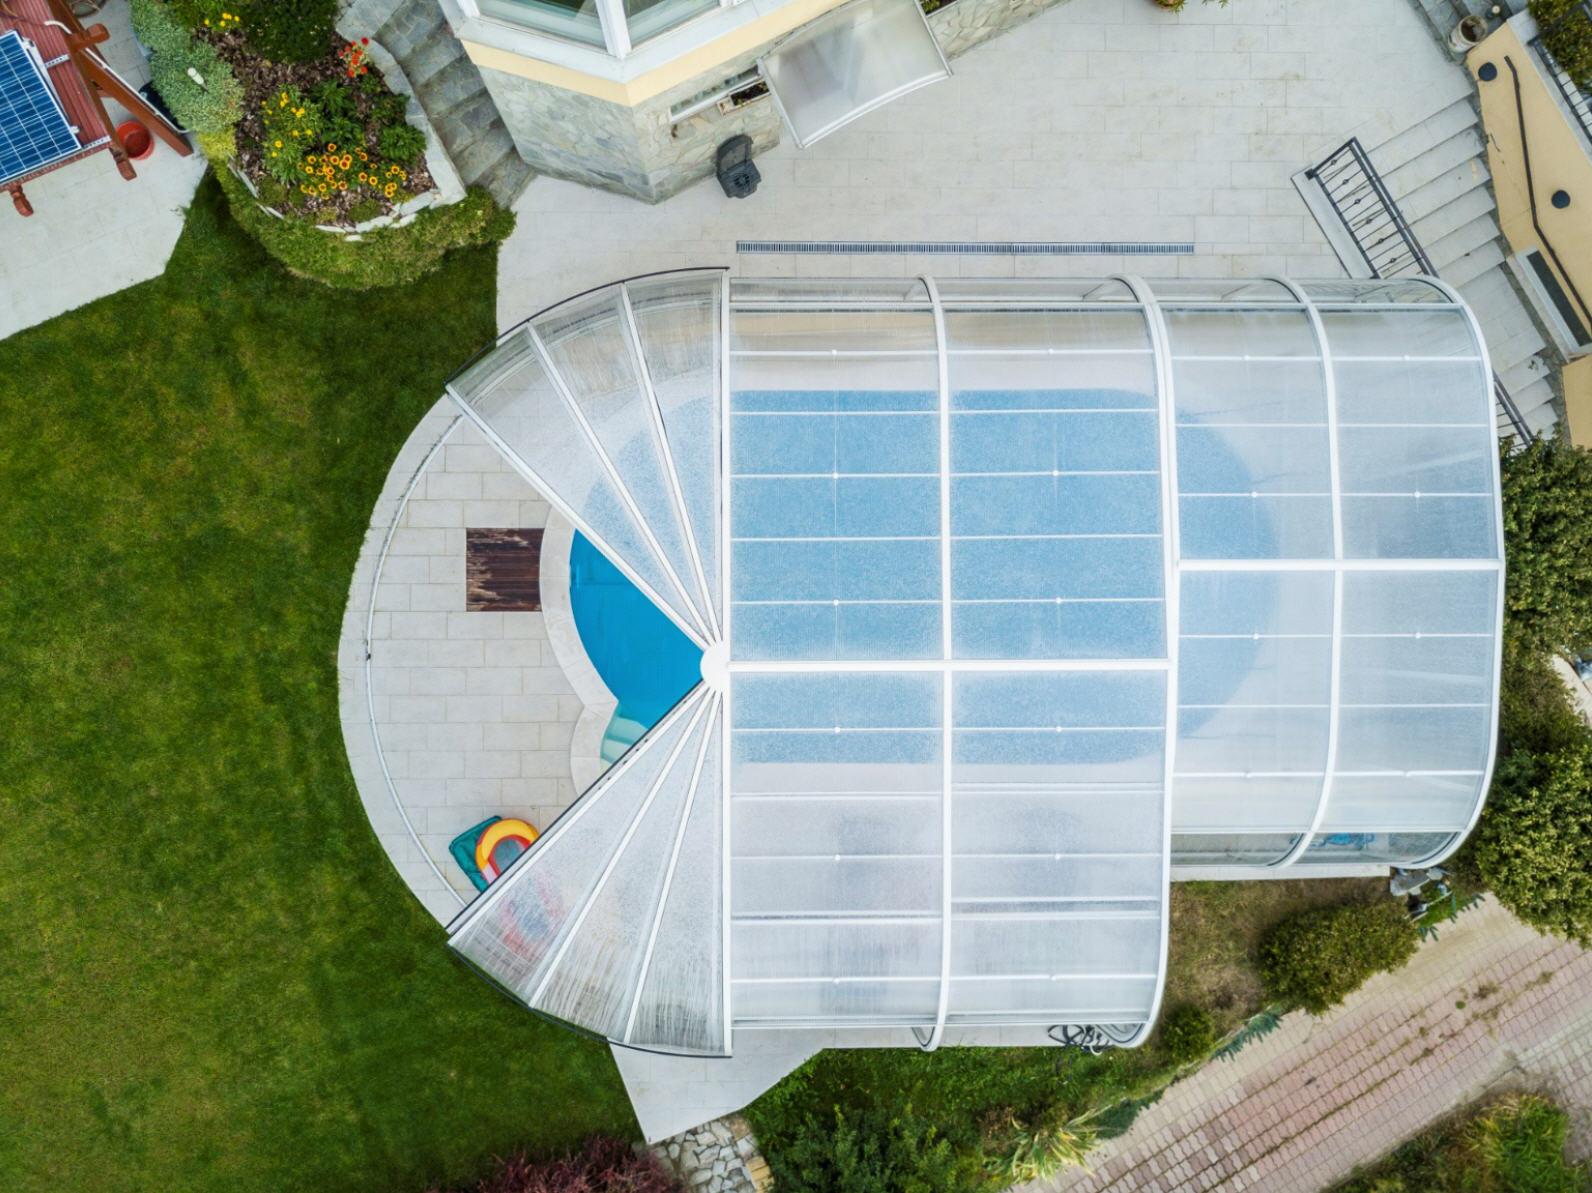 Galaxy-Pool-Enclosure-With-IRIS-End-01